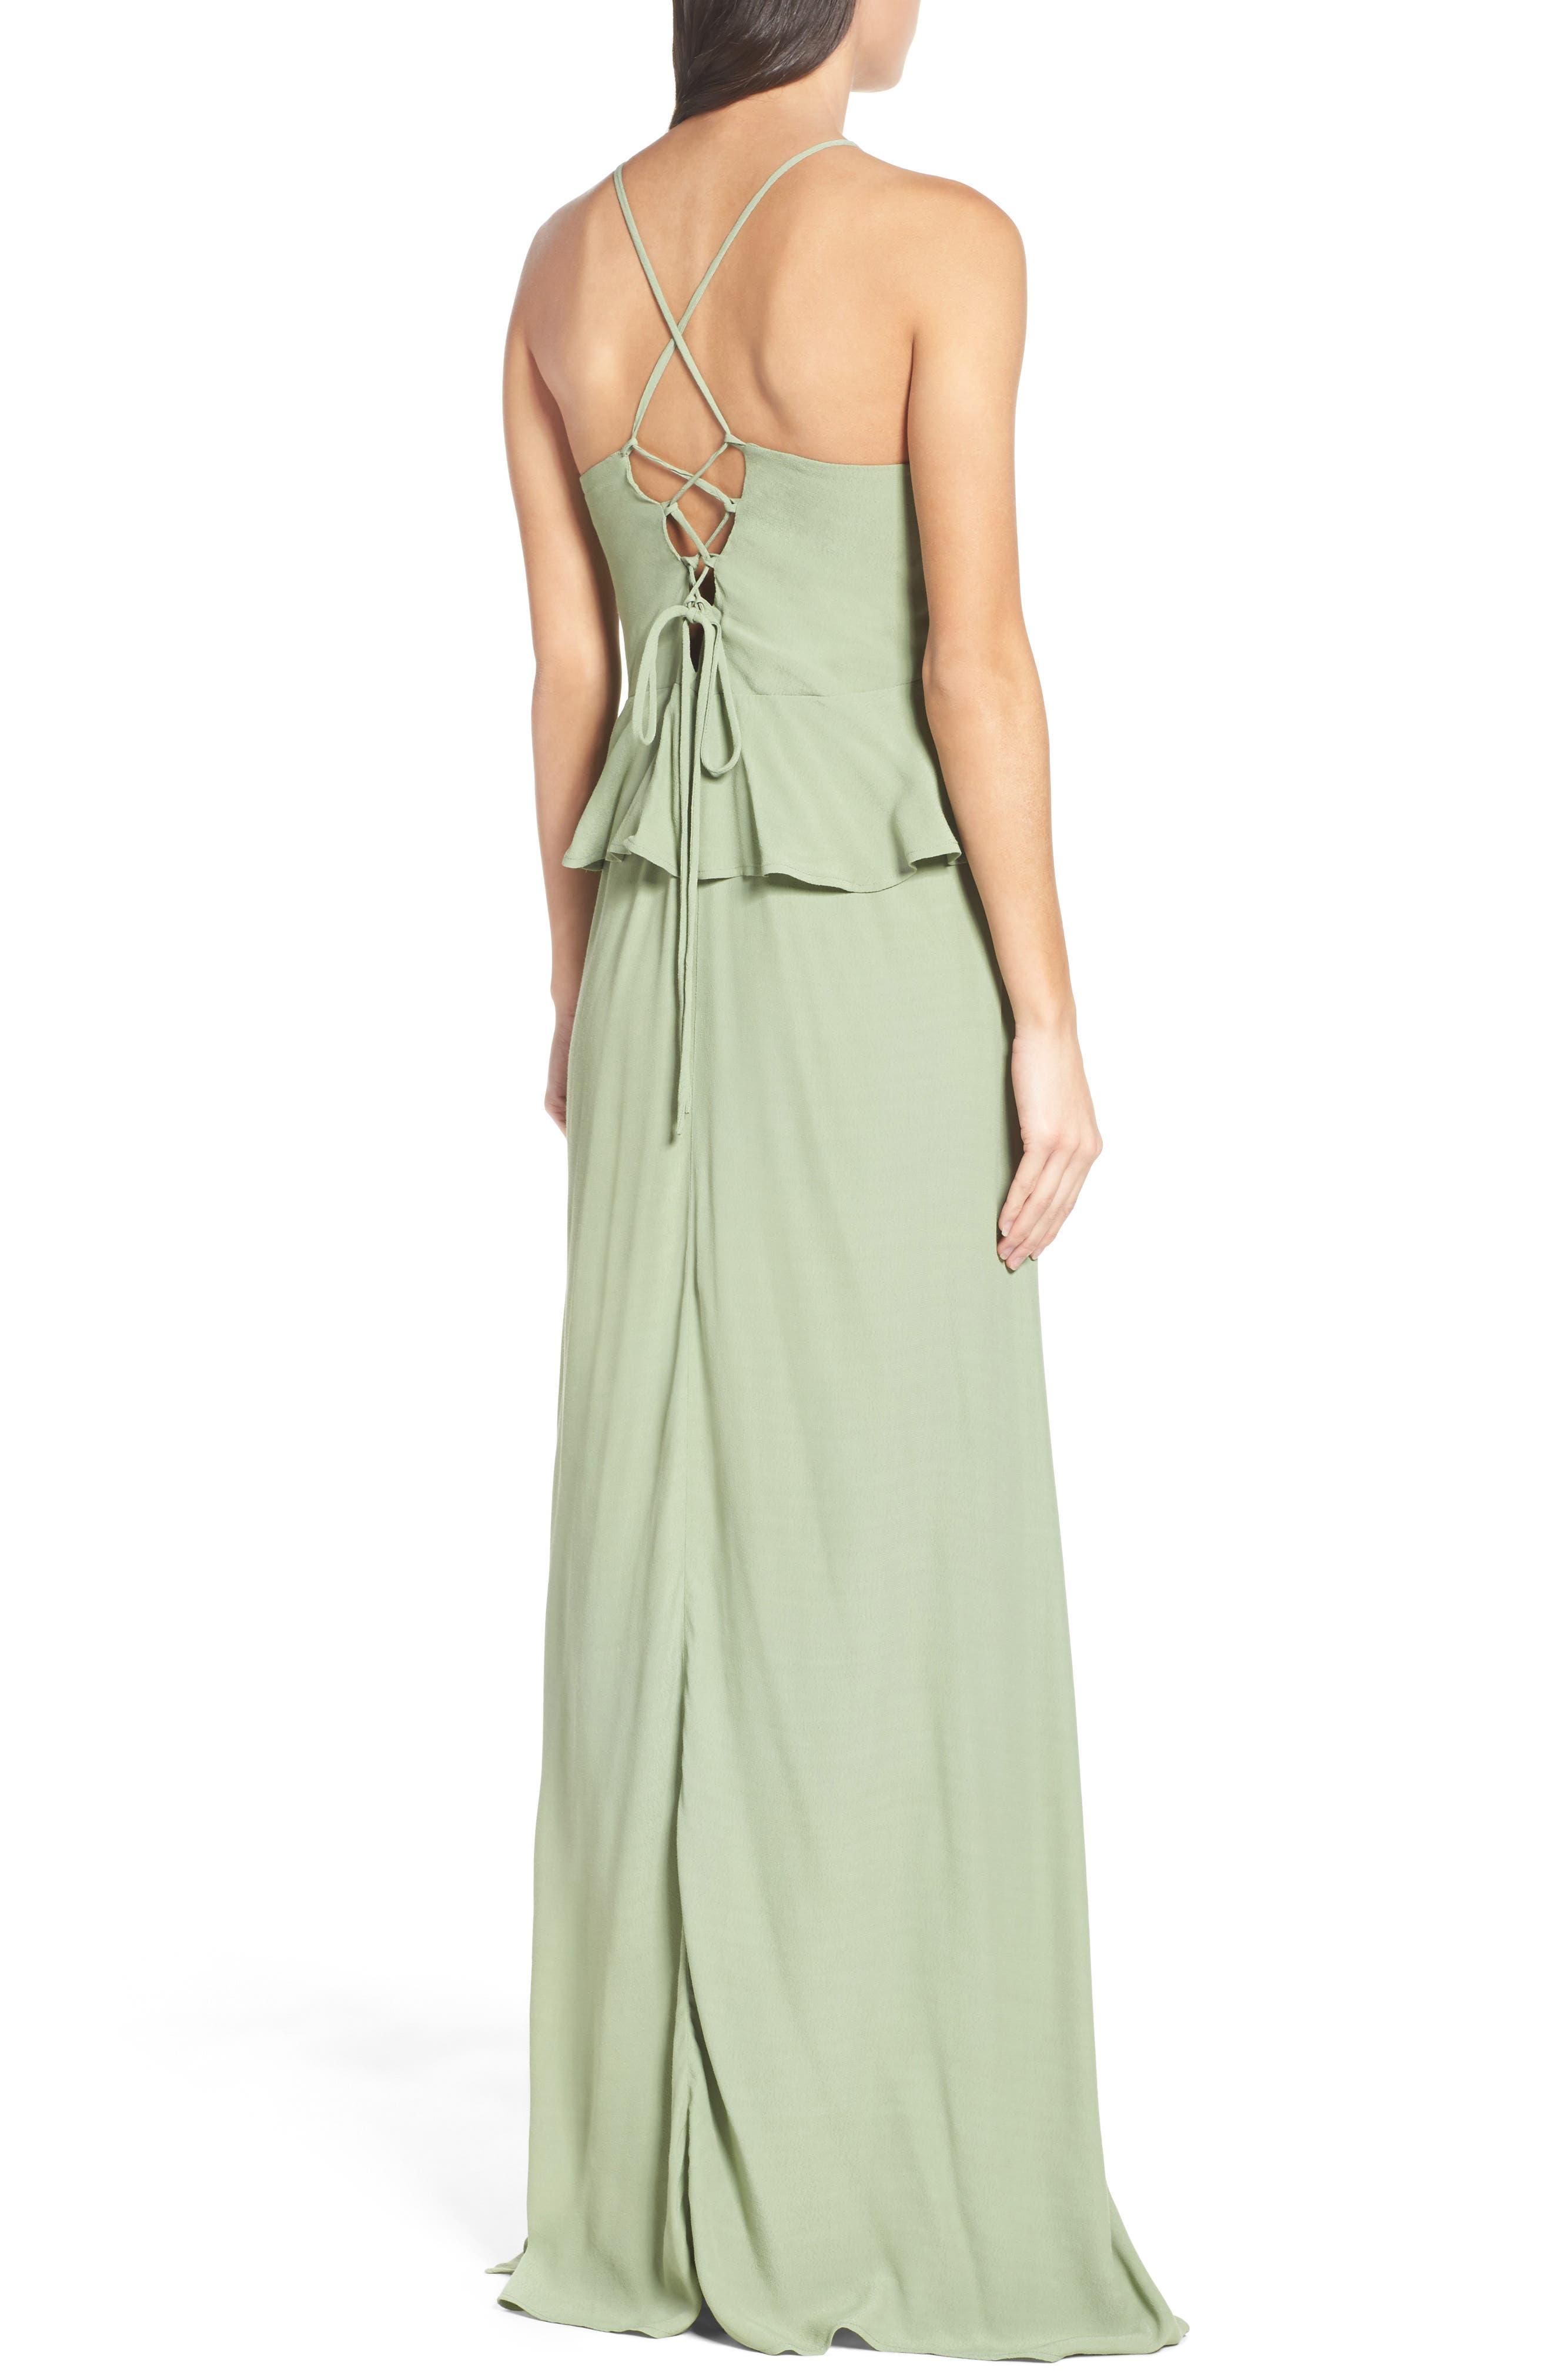 Roe + May Jolie Crepe Peplum Dress,                             Alternate thumbnail 2, color,                             310